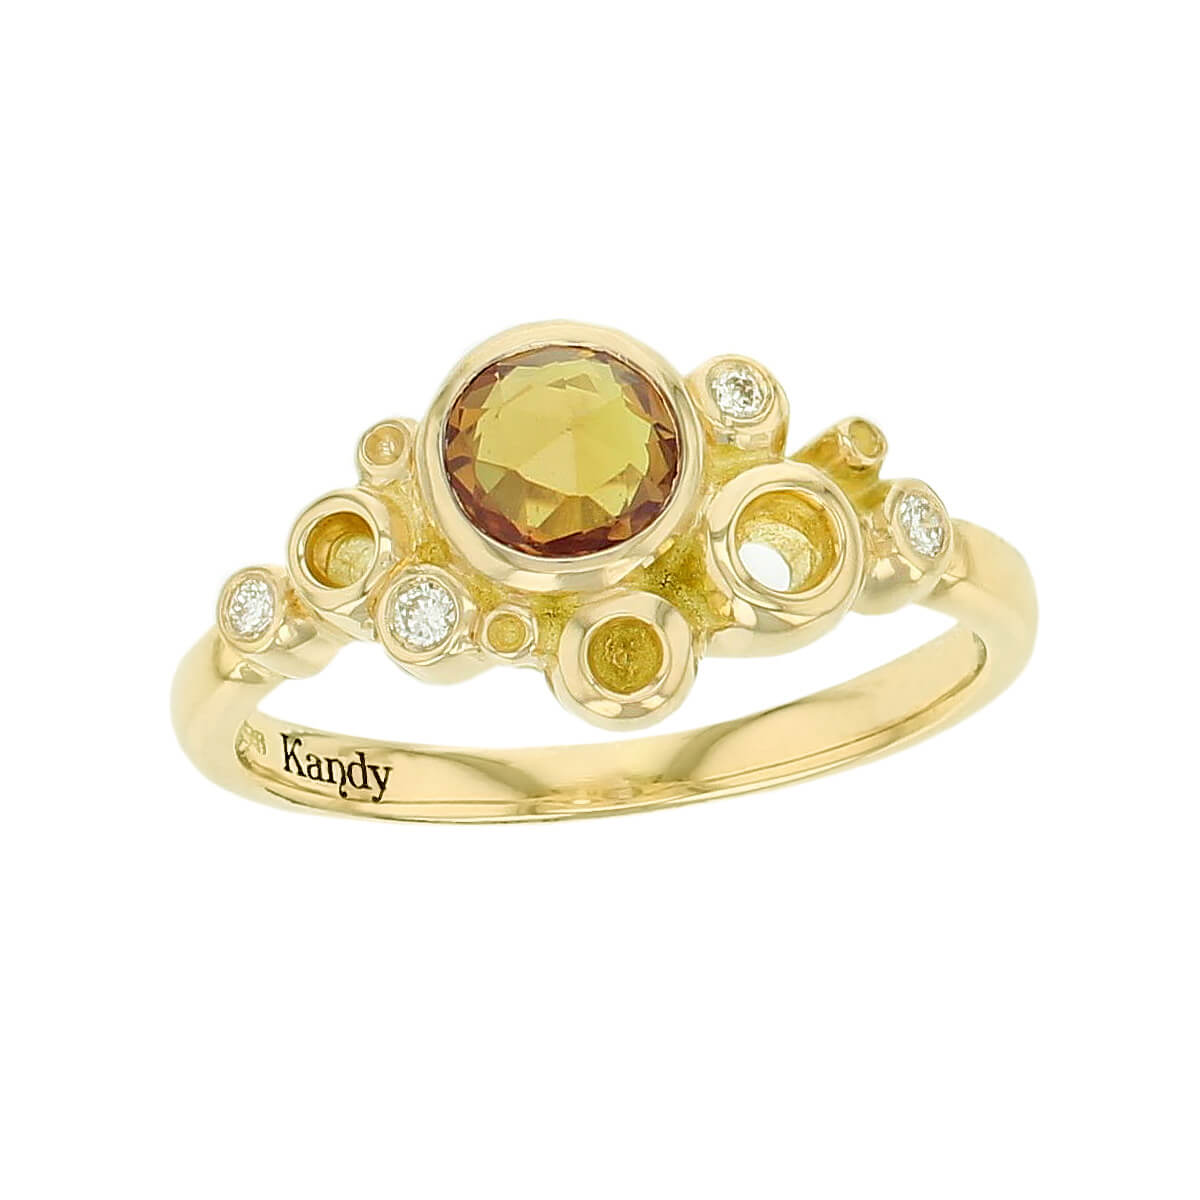 Kandy Fizz 18ct yellow gold yellow round rose cut sapphire gemstone ladies dress ring, designer jewellery, gem, jewelry, handmade by Faller, Londonderry, Northern Ireland, Irish hand crafted